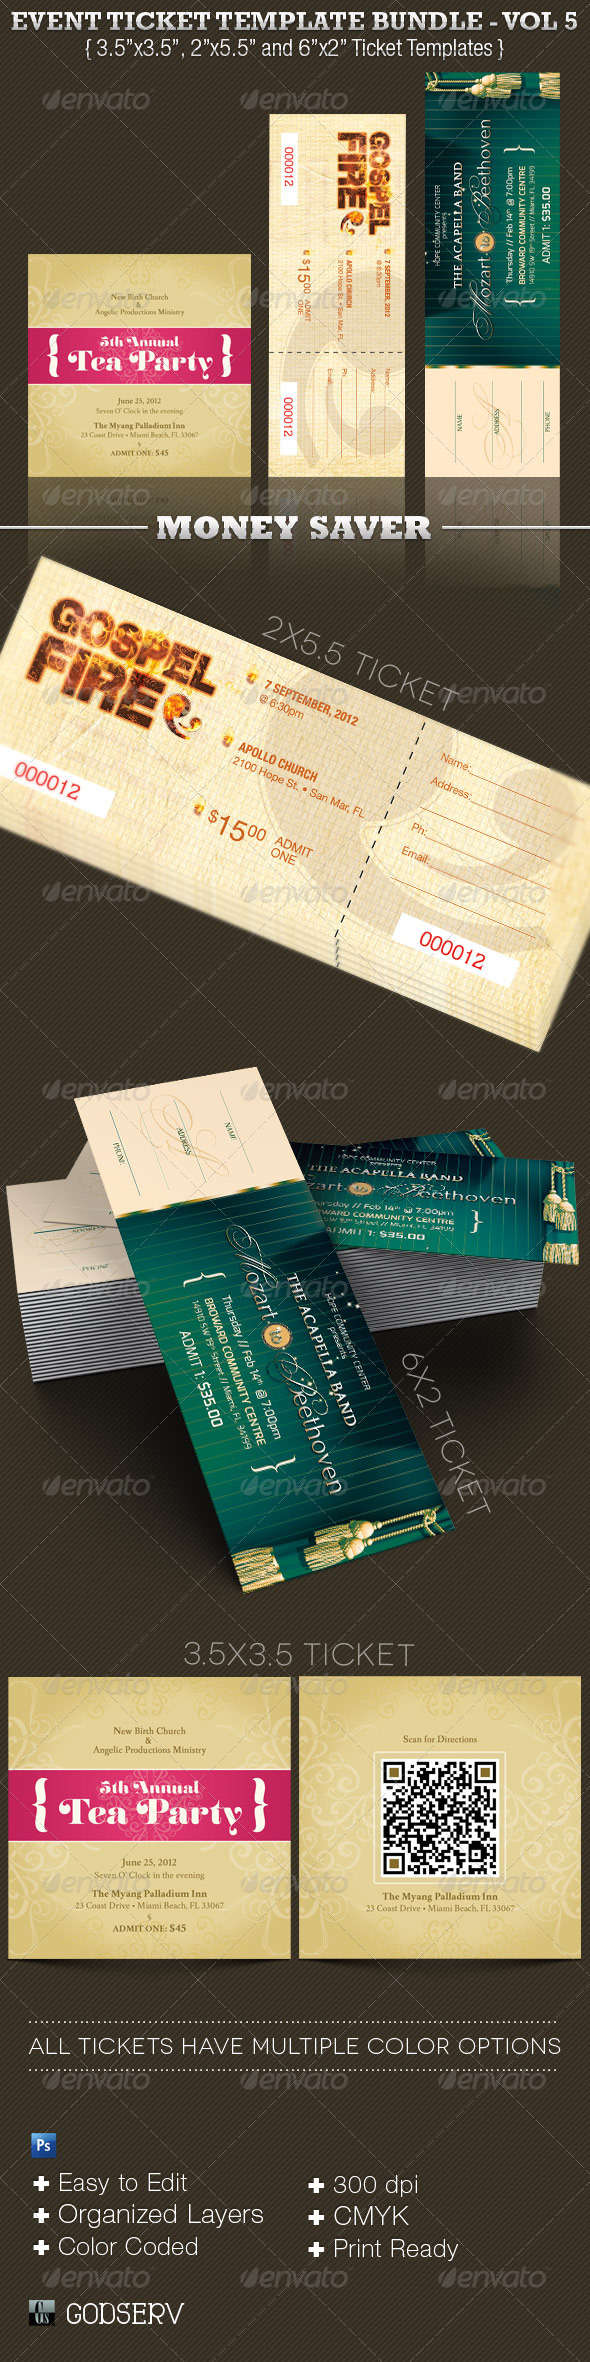 Event Ticket Template Bundle Vol 5 - Miscellaneous Print Templates